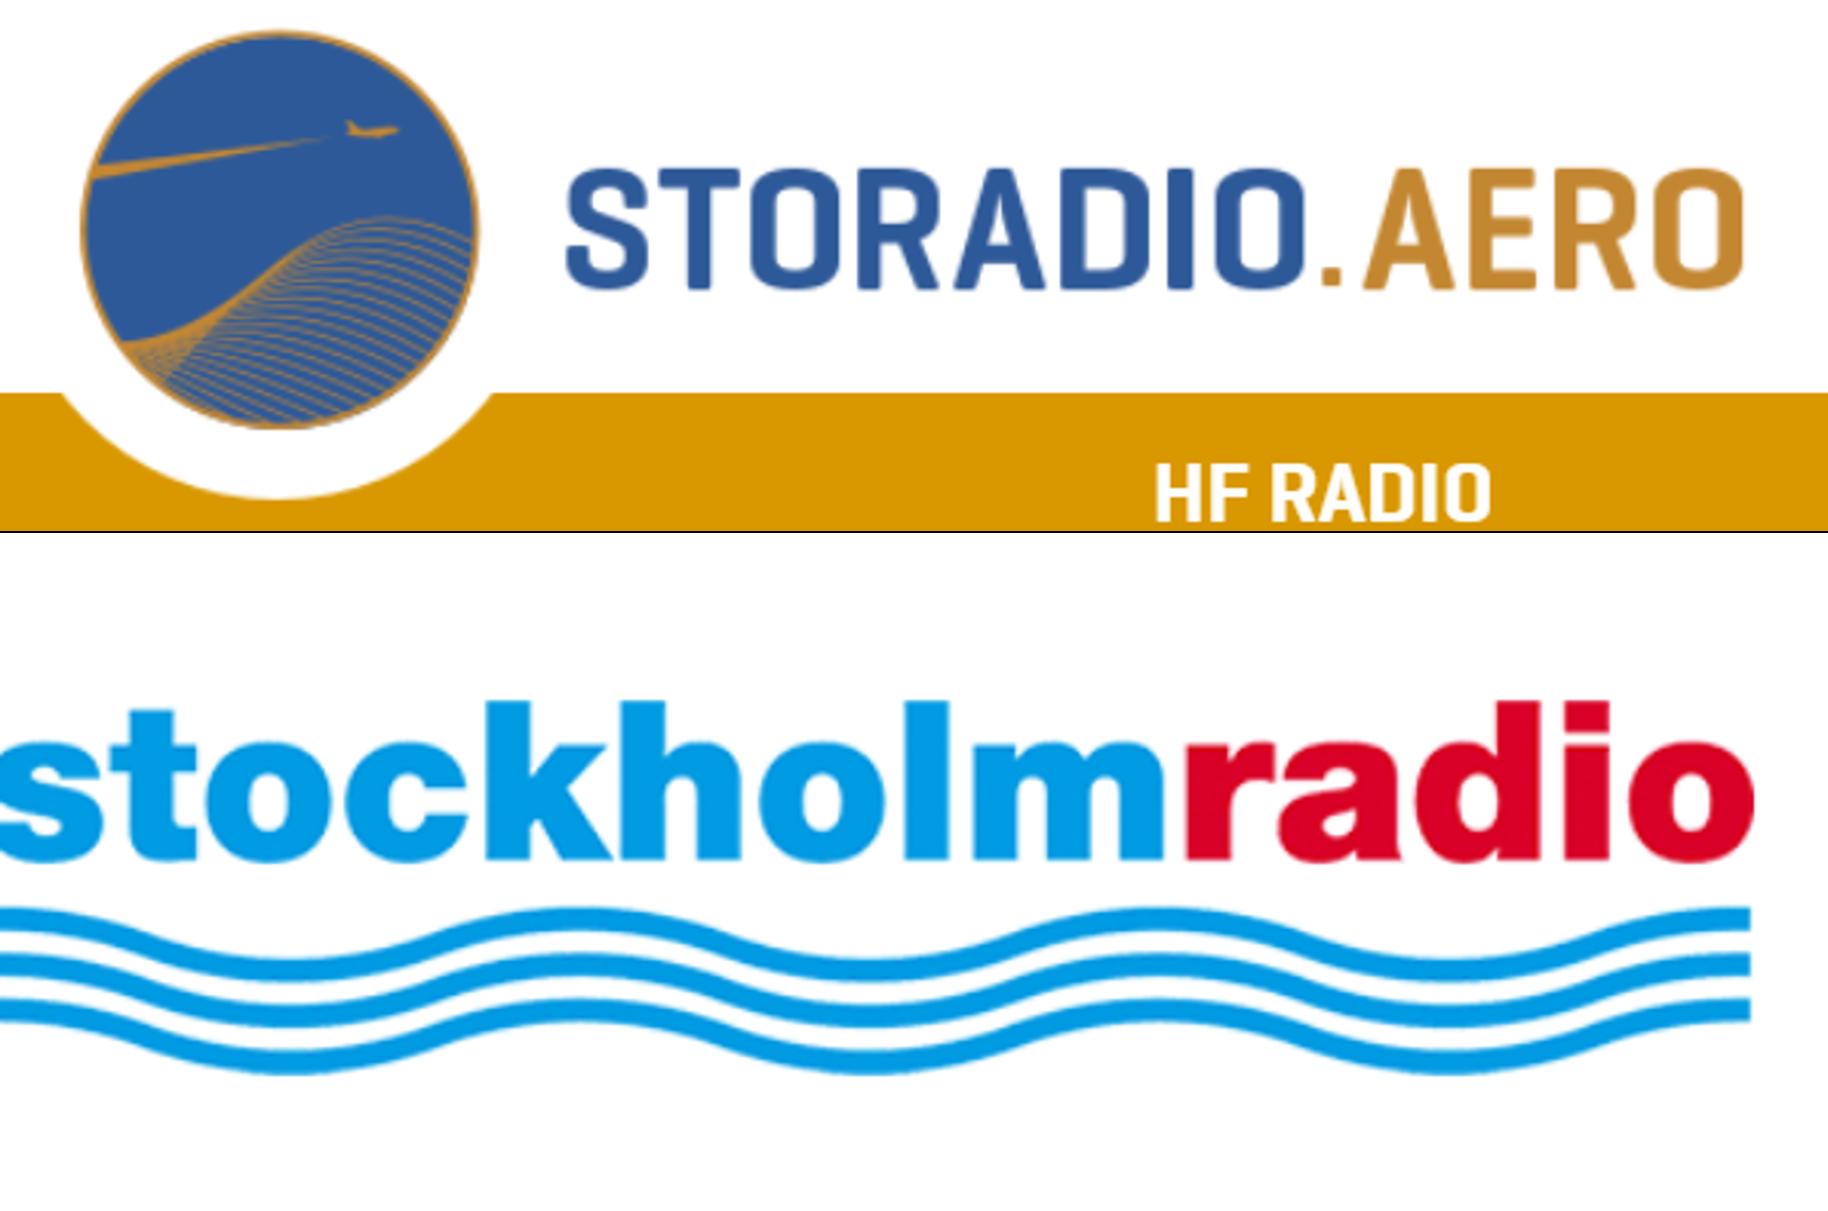 Stockholm_Radio_stor_aero_logo